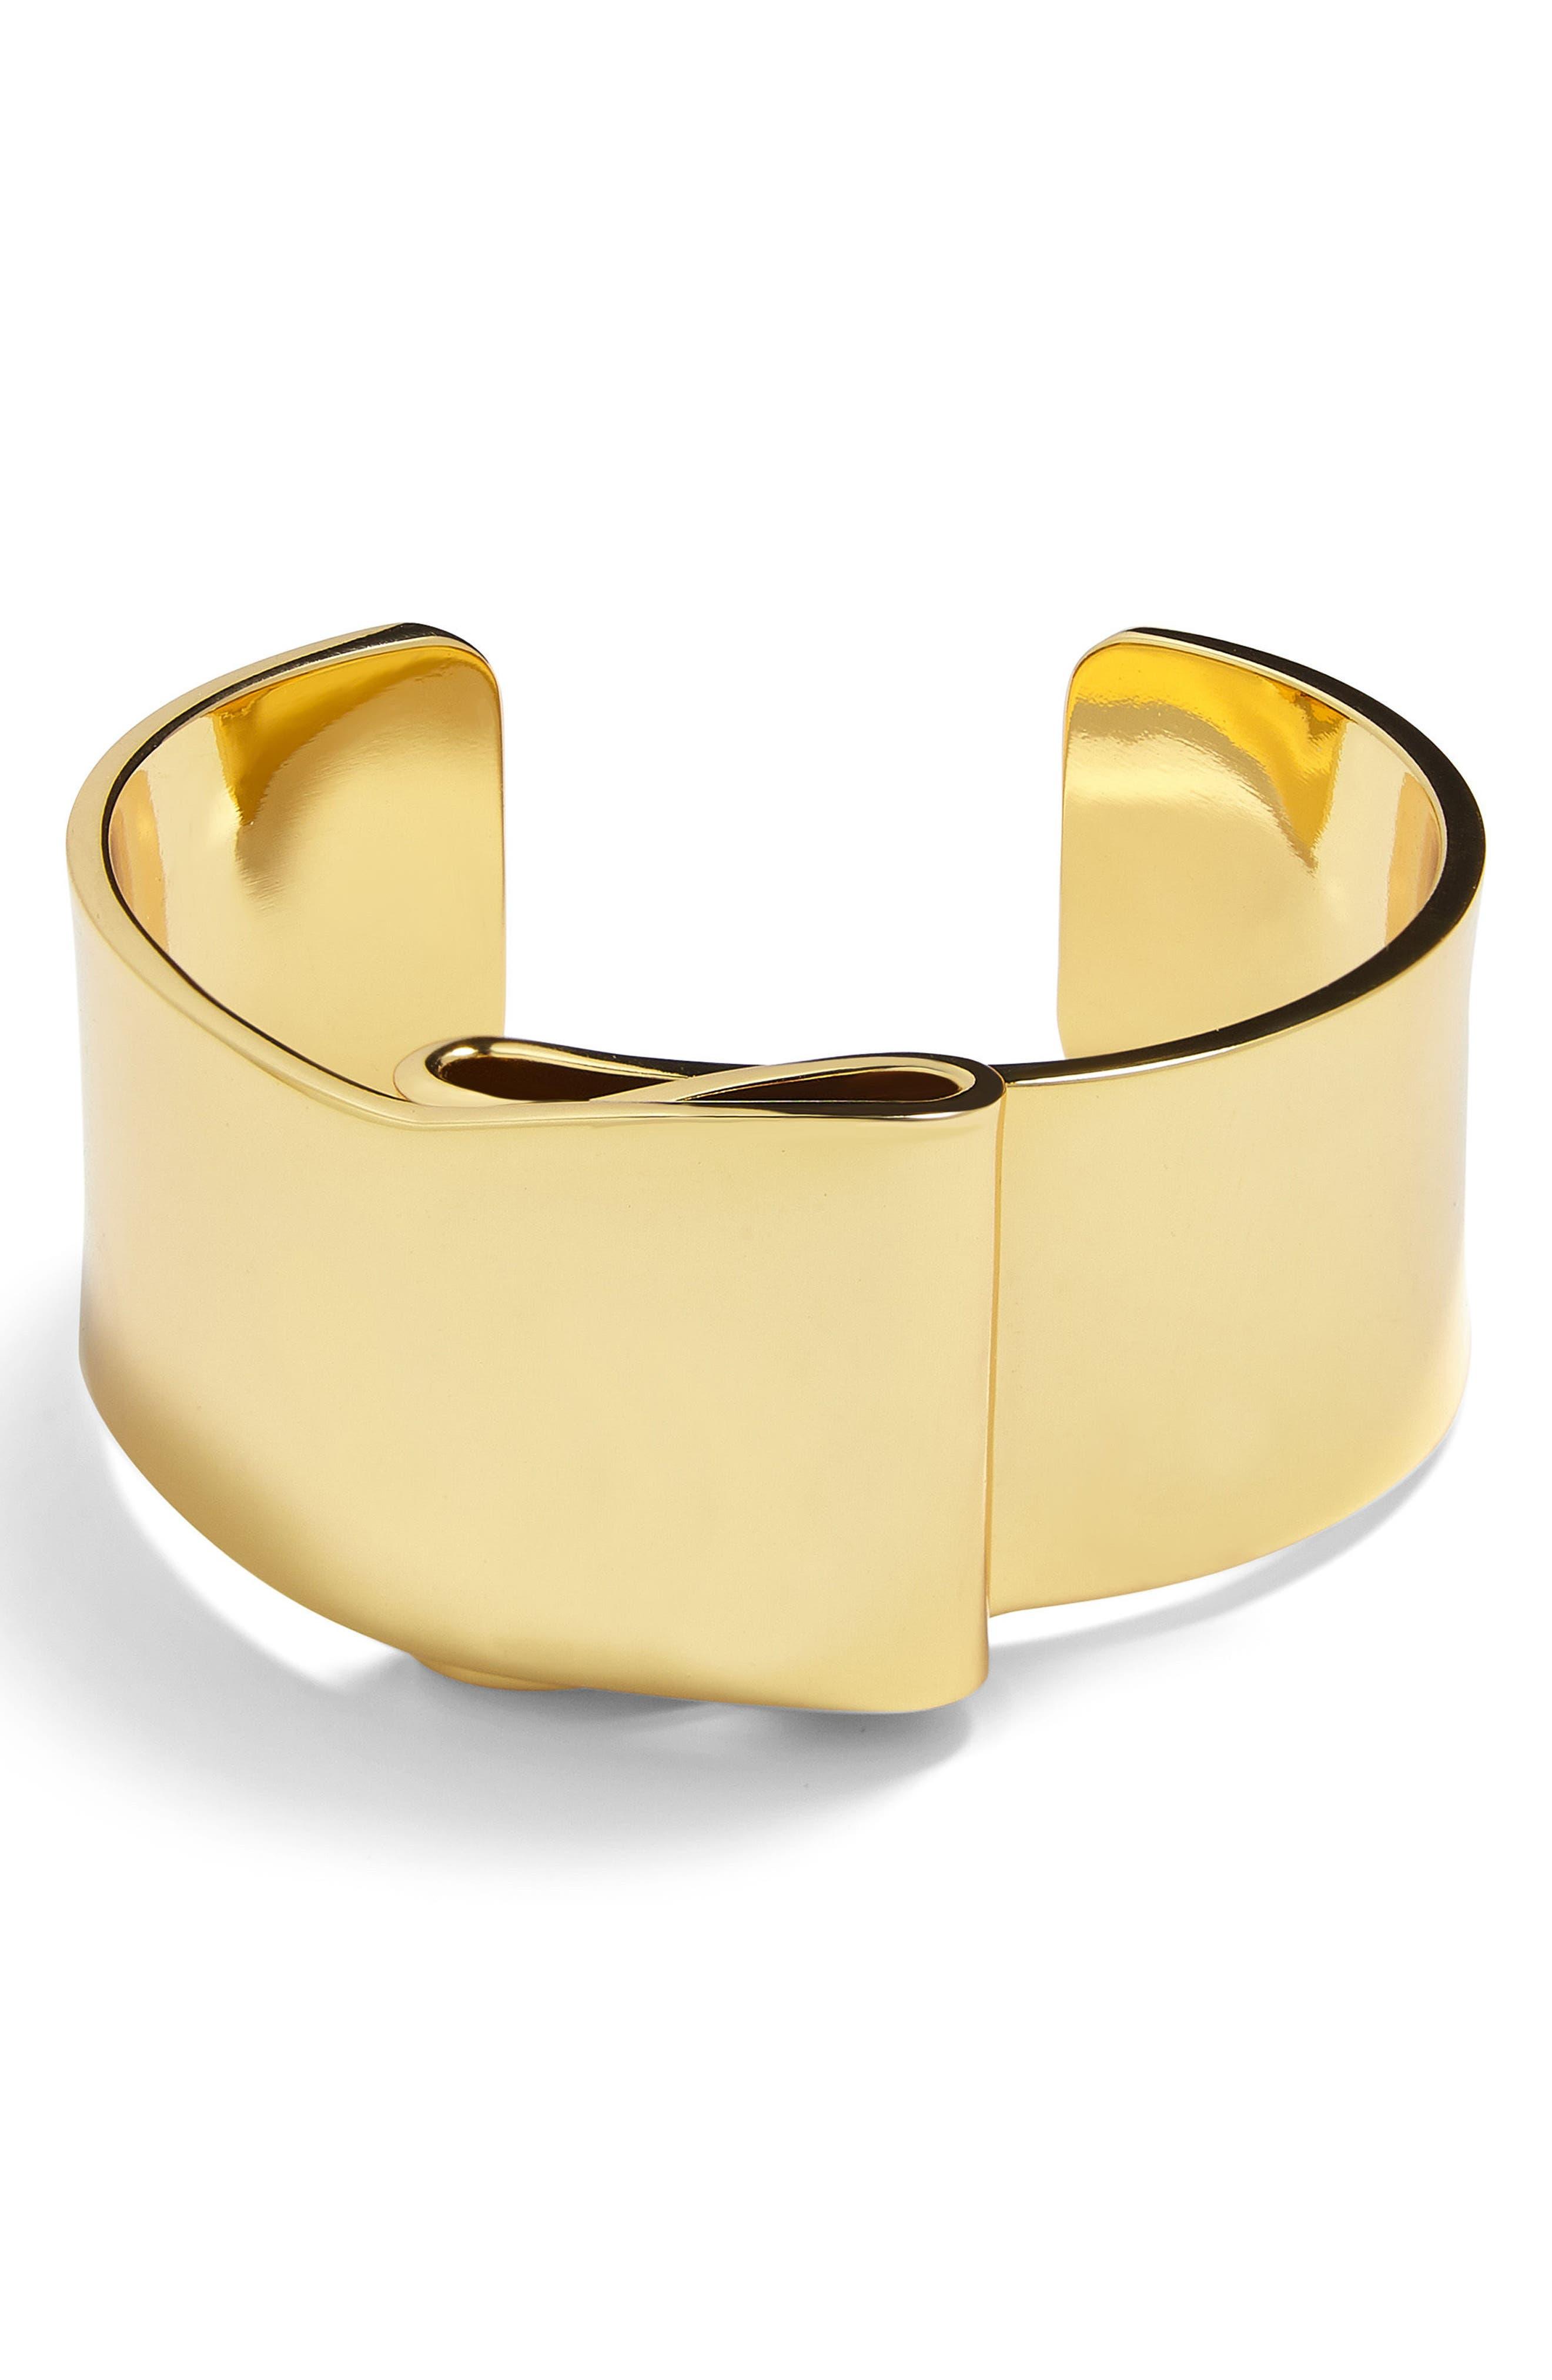 Navina Cuff Bracelet,                             Main thumbnail 1, color,                             719